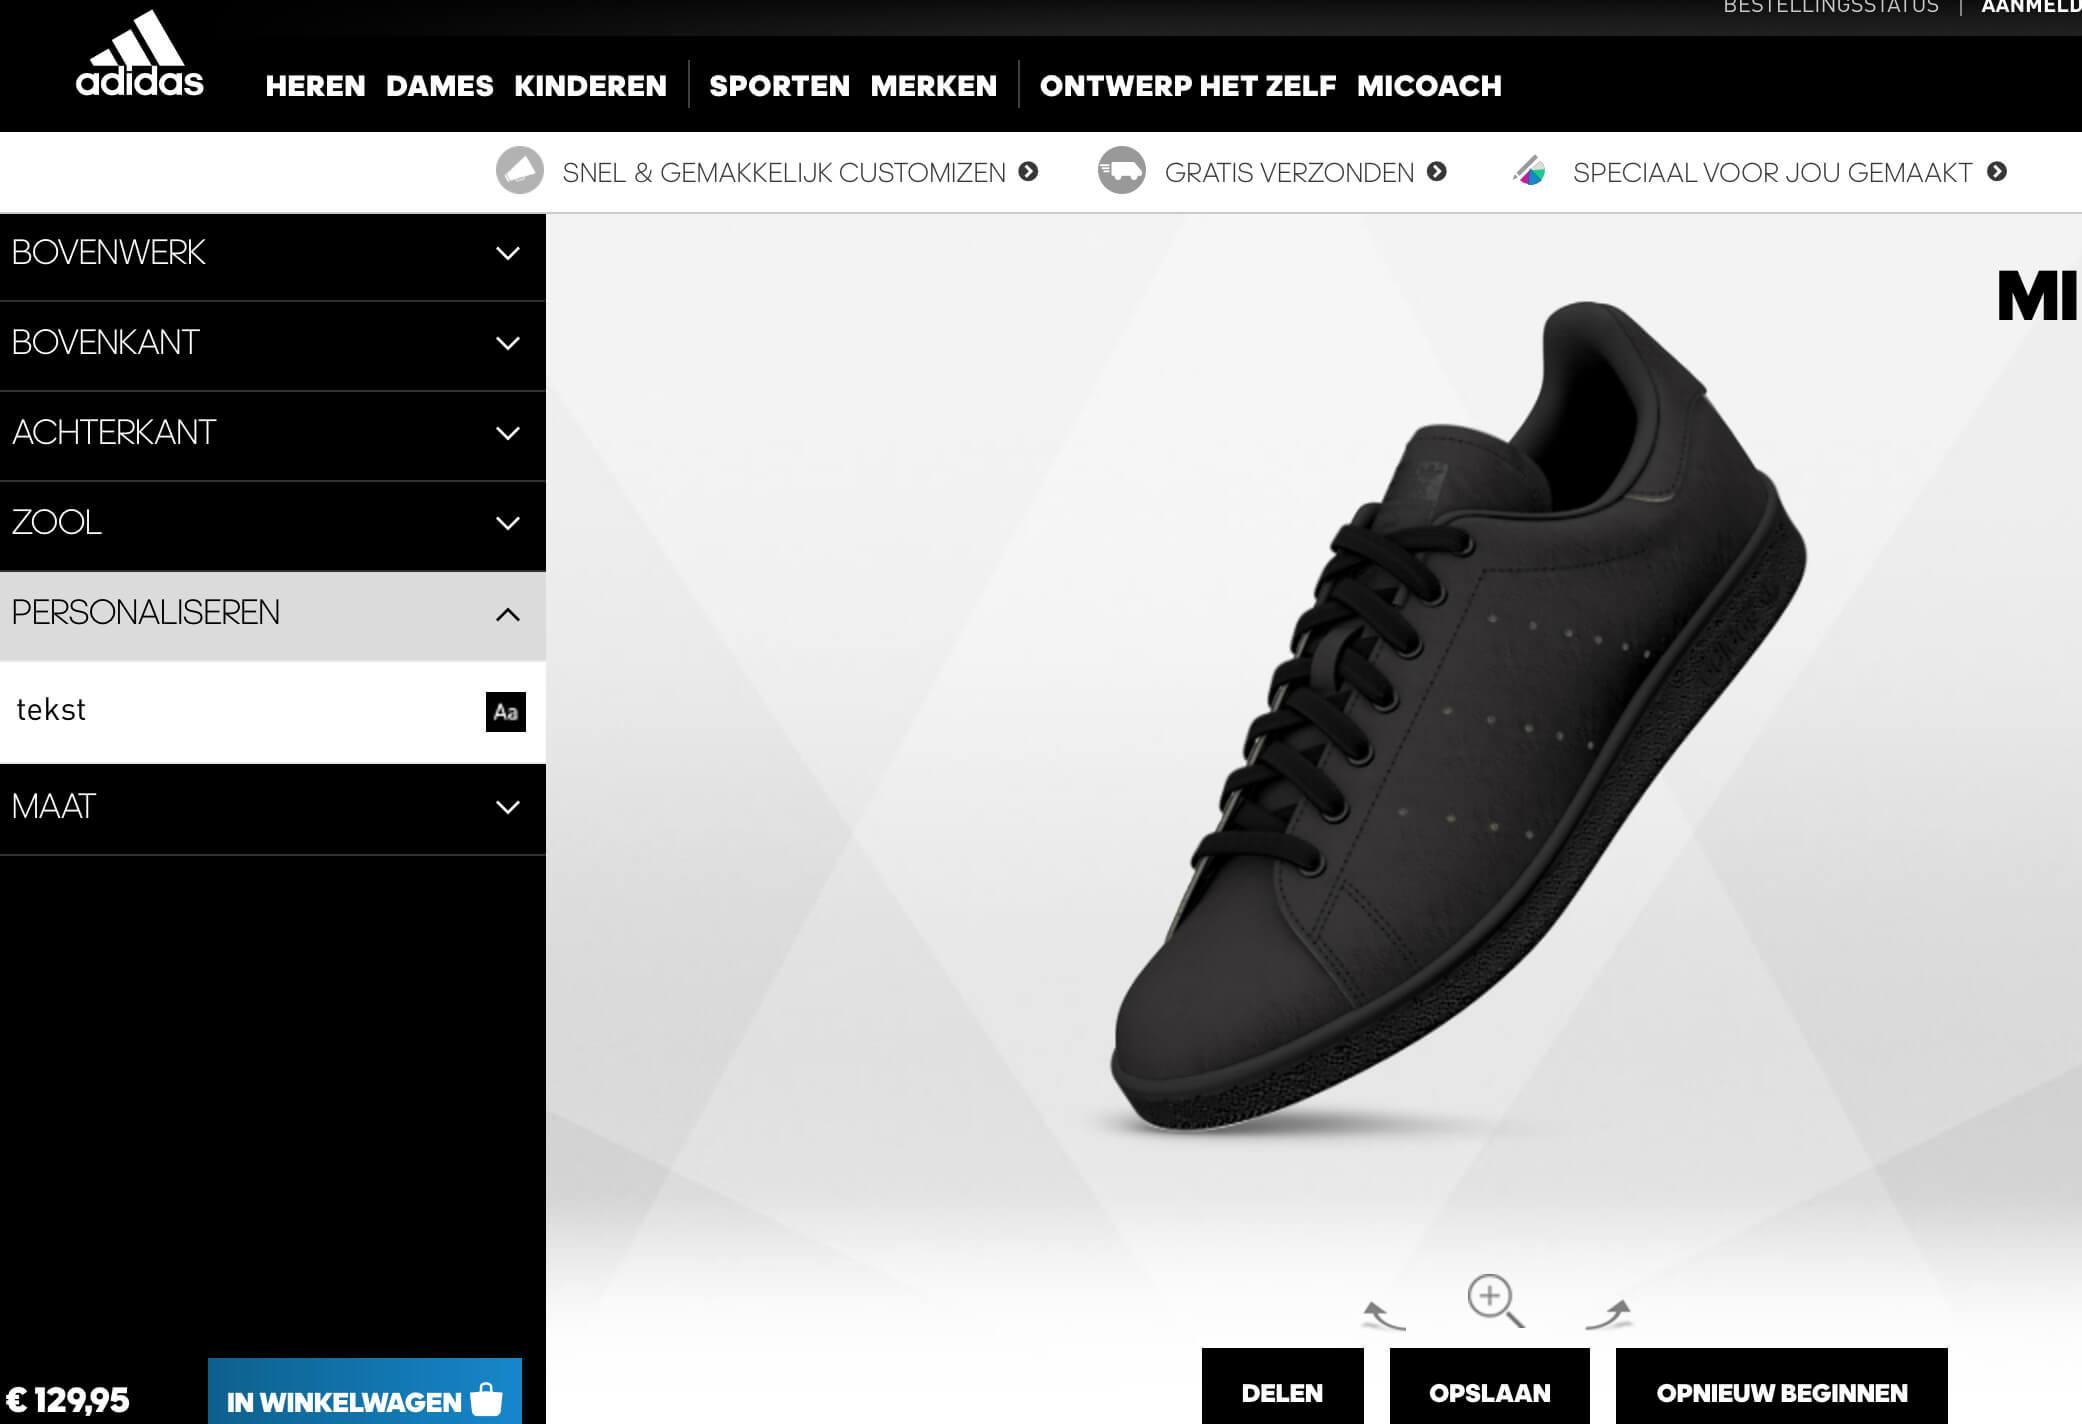 Ontwerp je eigen Nike, Adidas of Reebok sneakers - Bekijk de ...